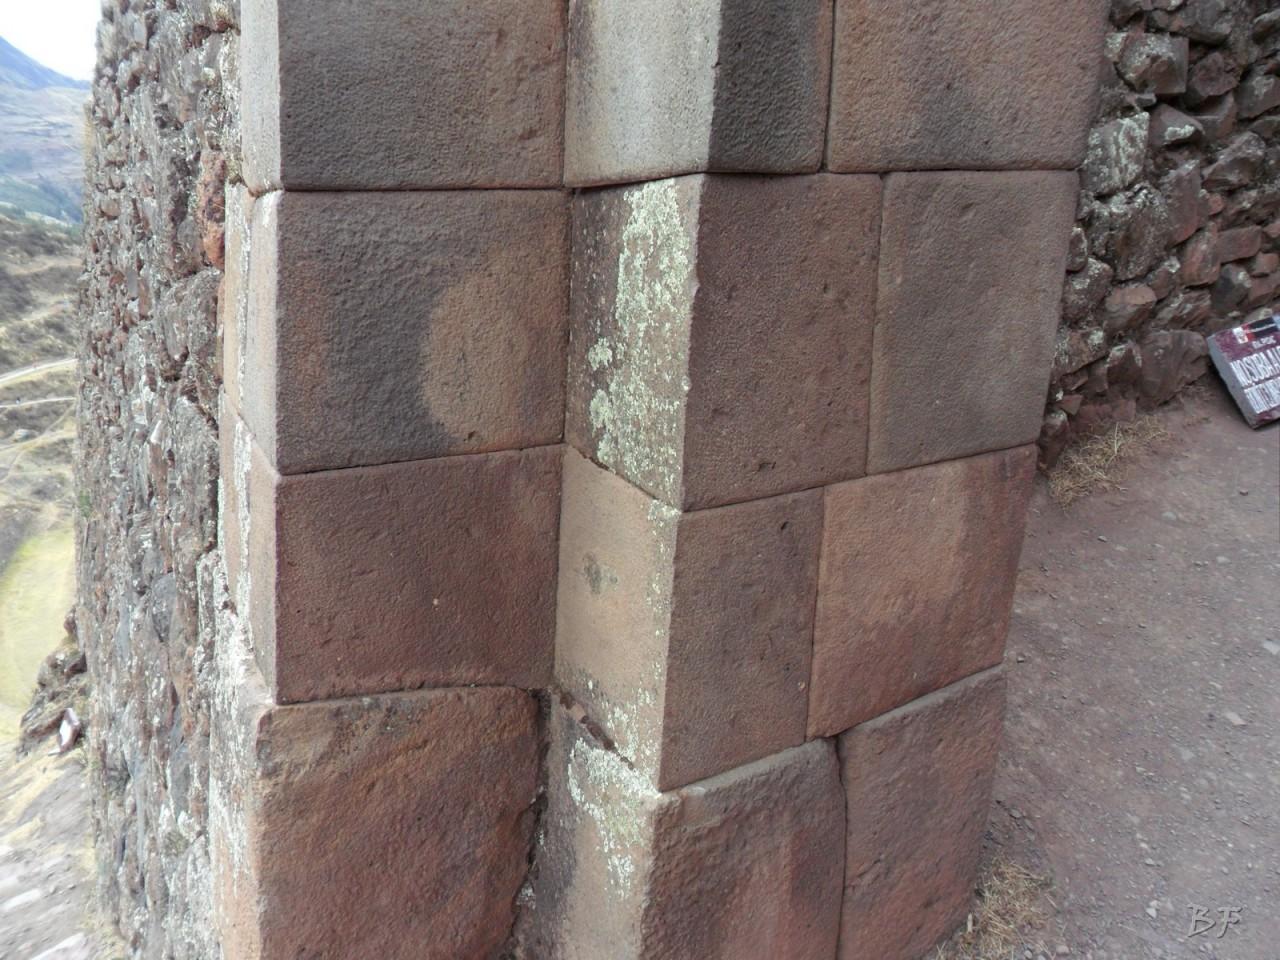 Mura-Poligonali-Megaliti-Altari-Rupestri-Pisac-Cusco-Perù-22